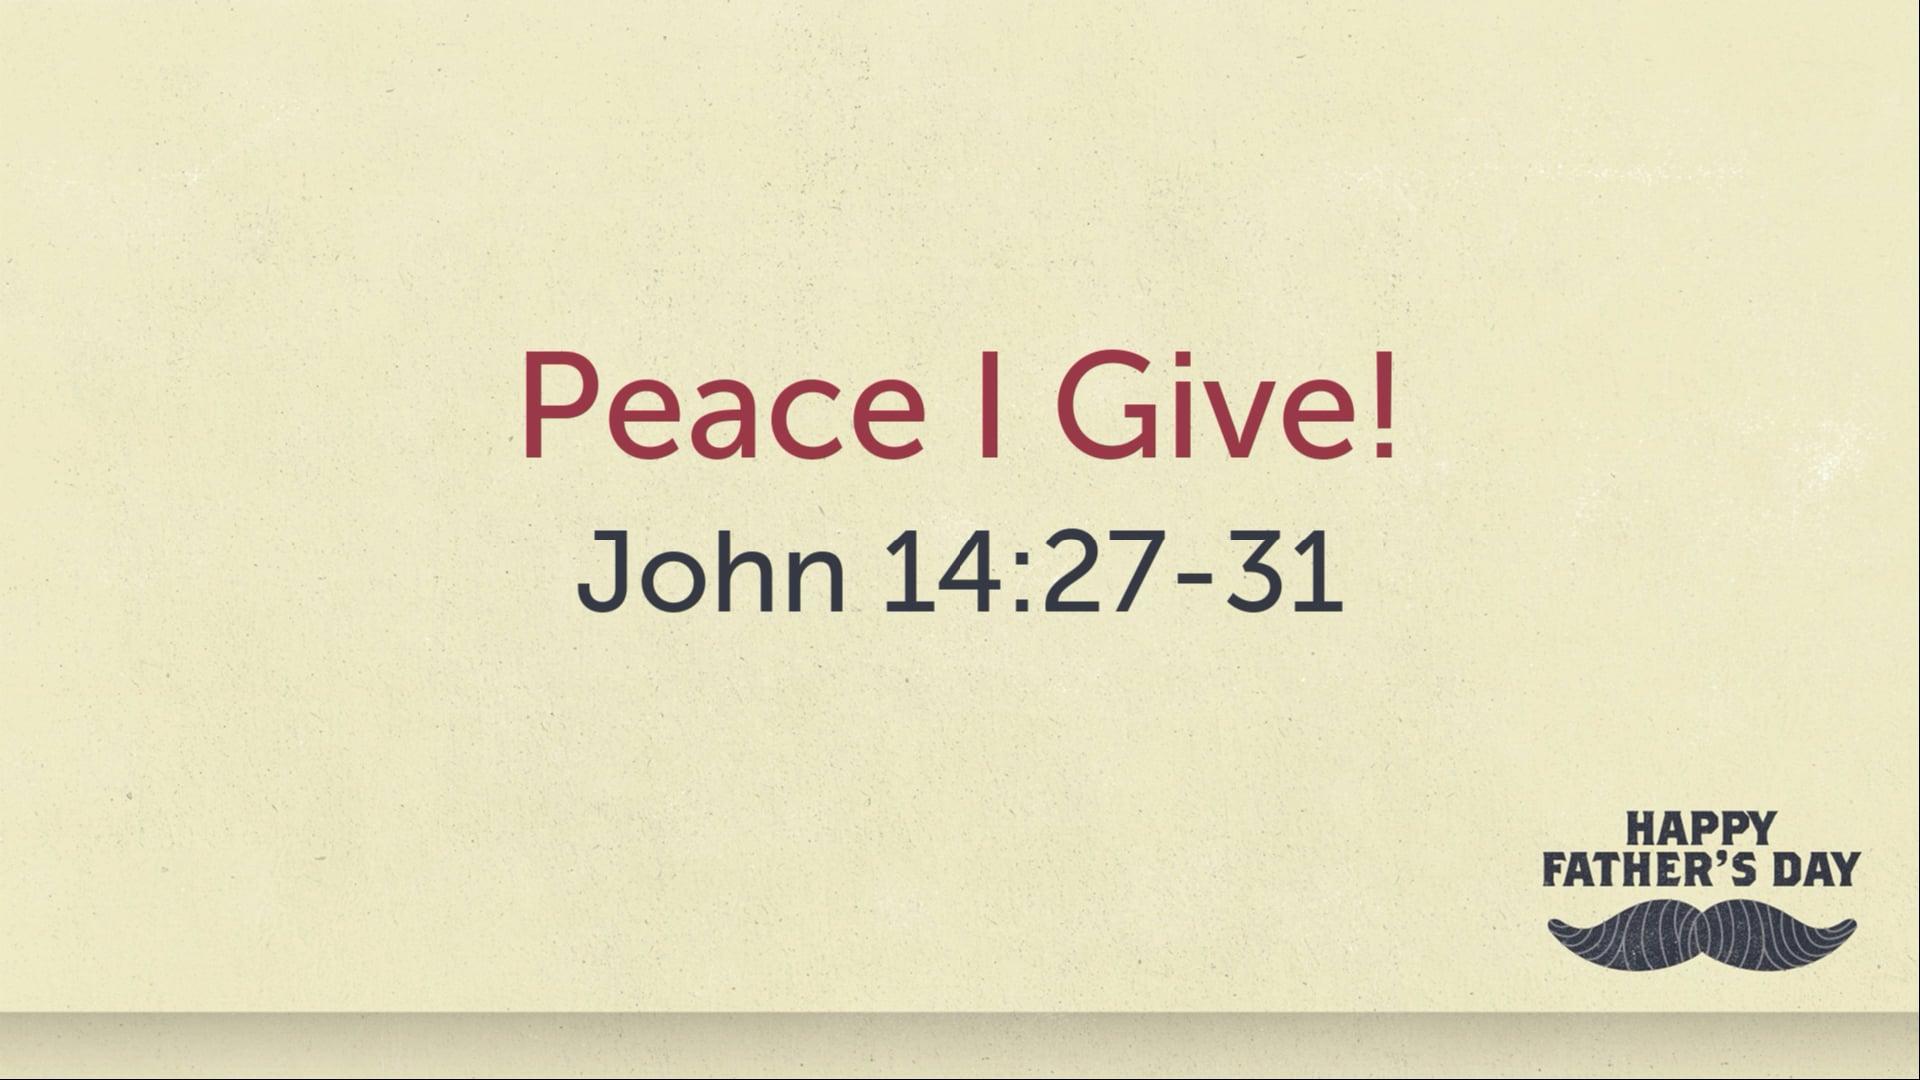 Peace I Give - John 14:27